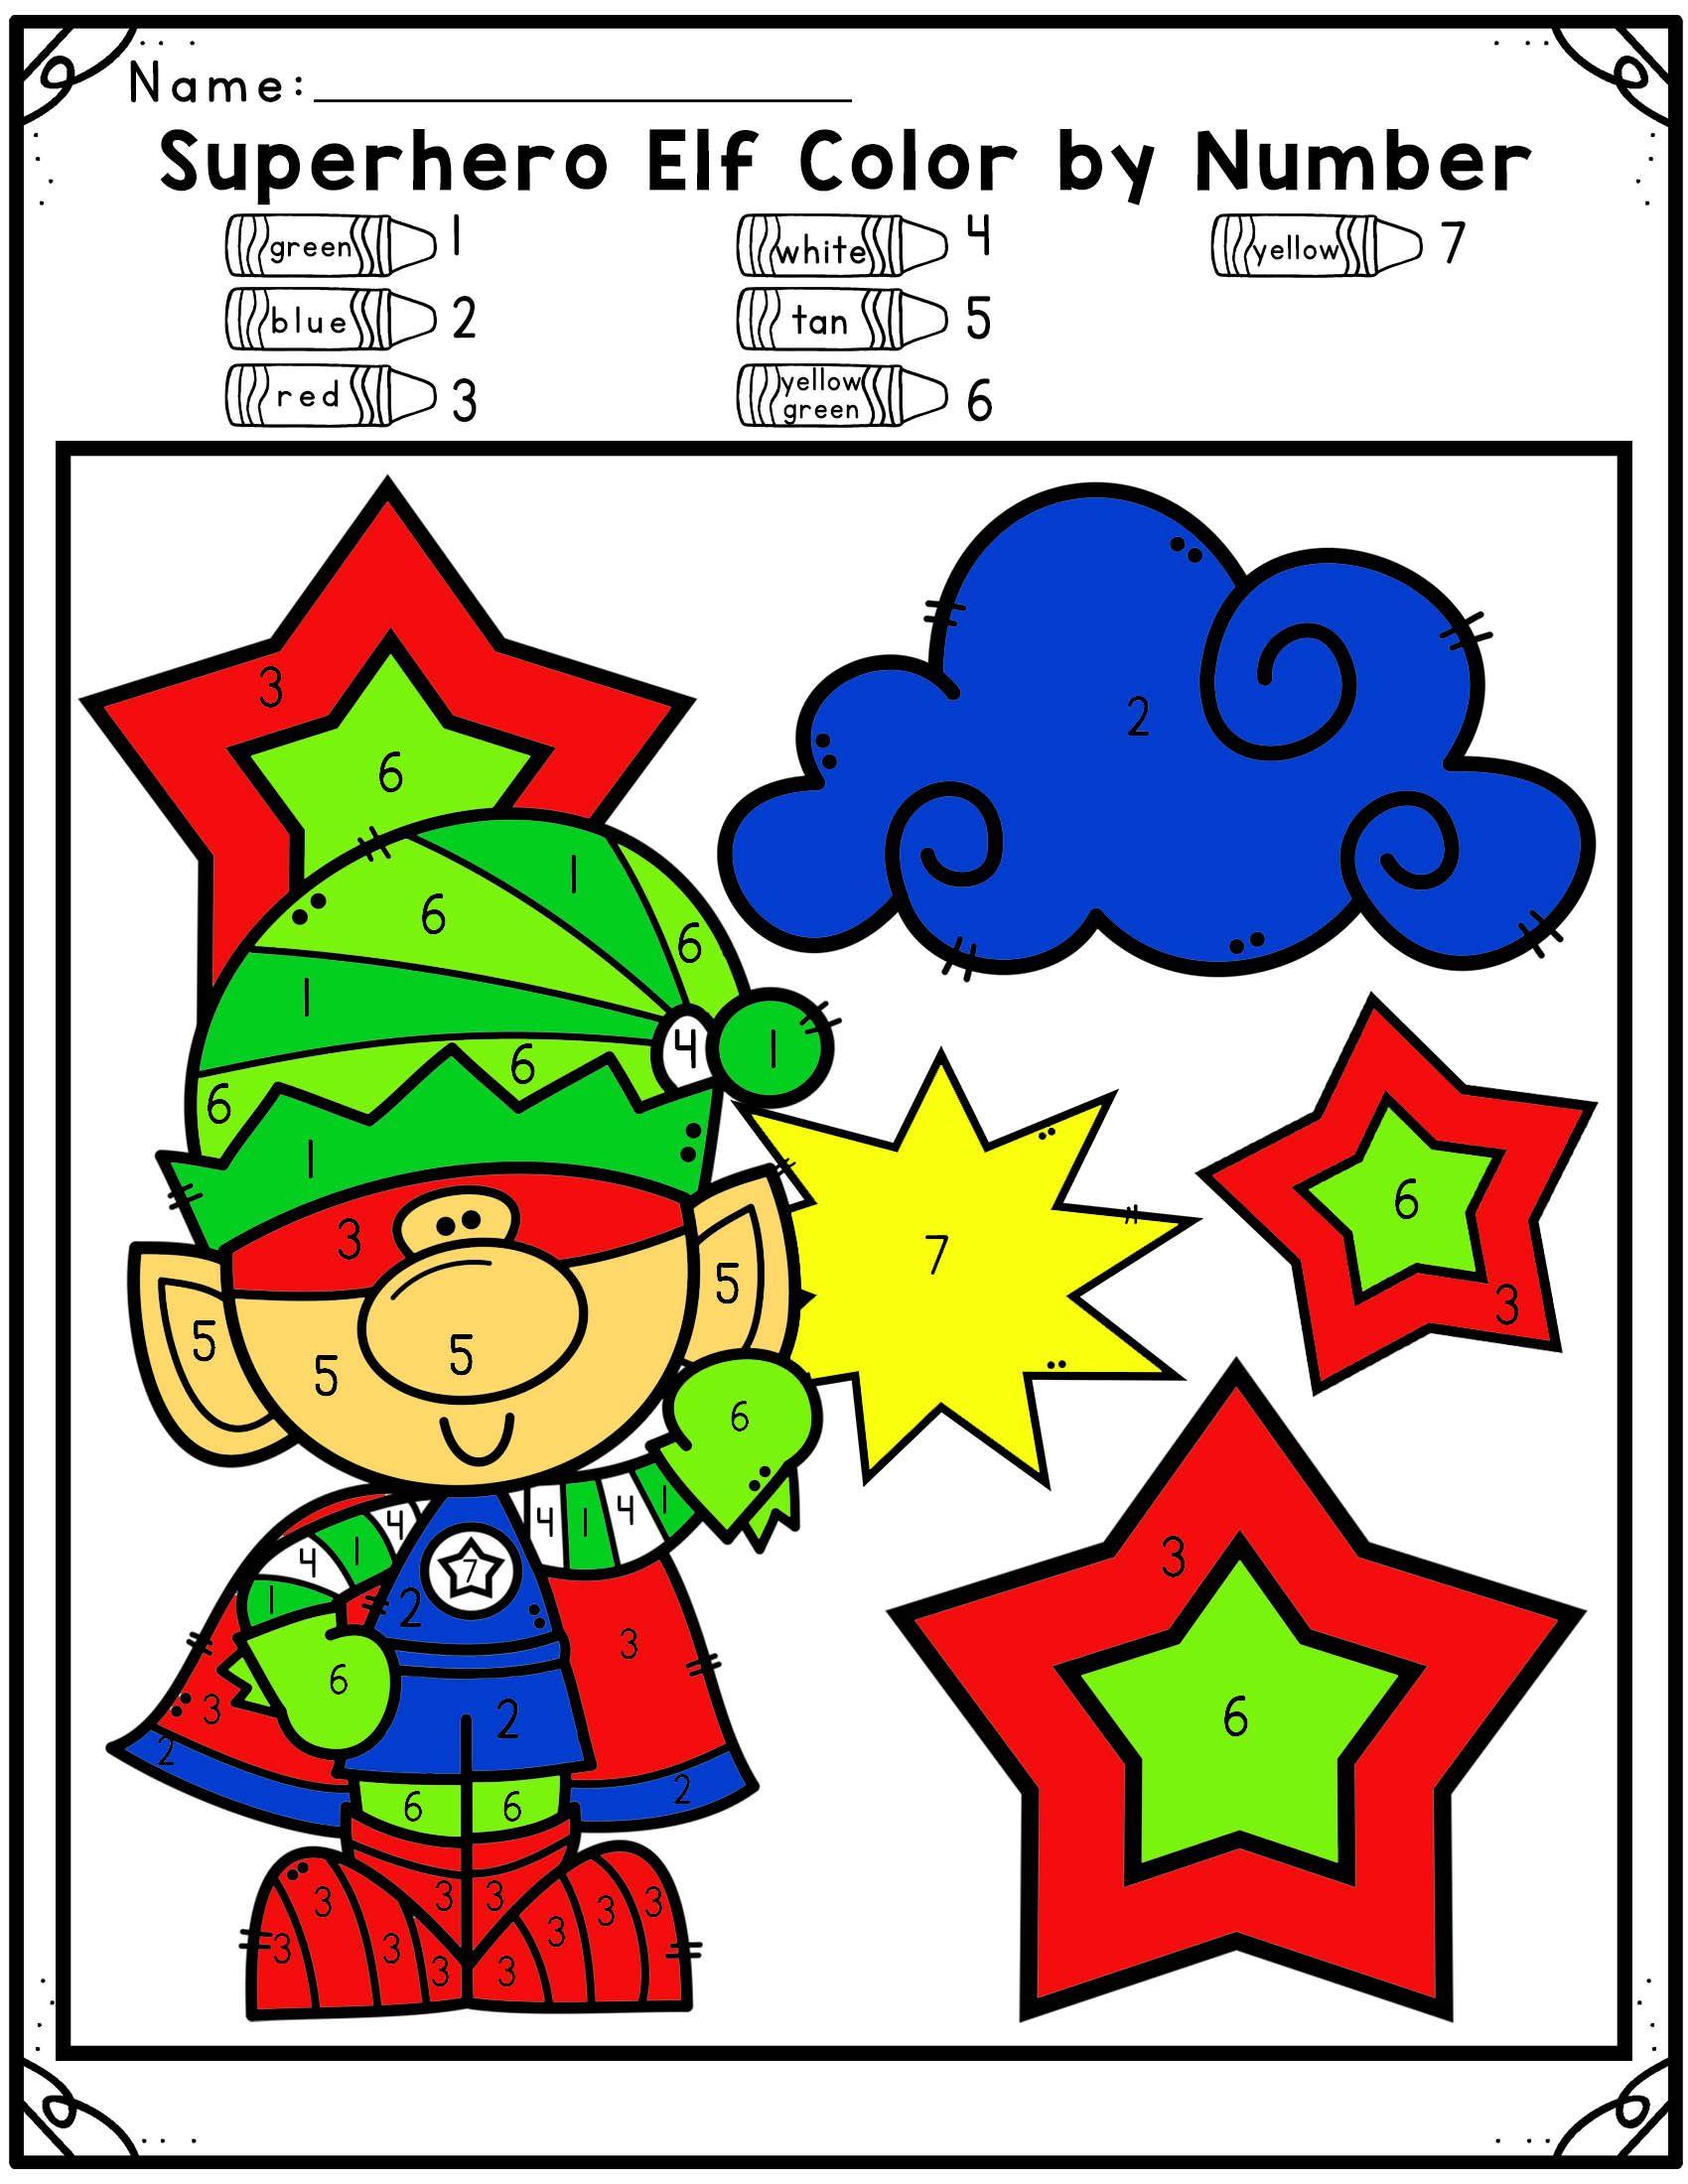 Superhero Elf Color By Number